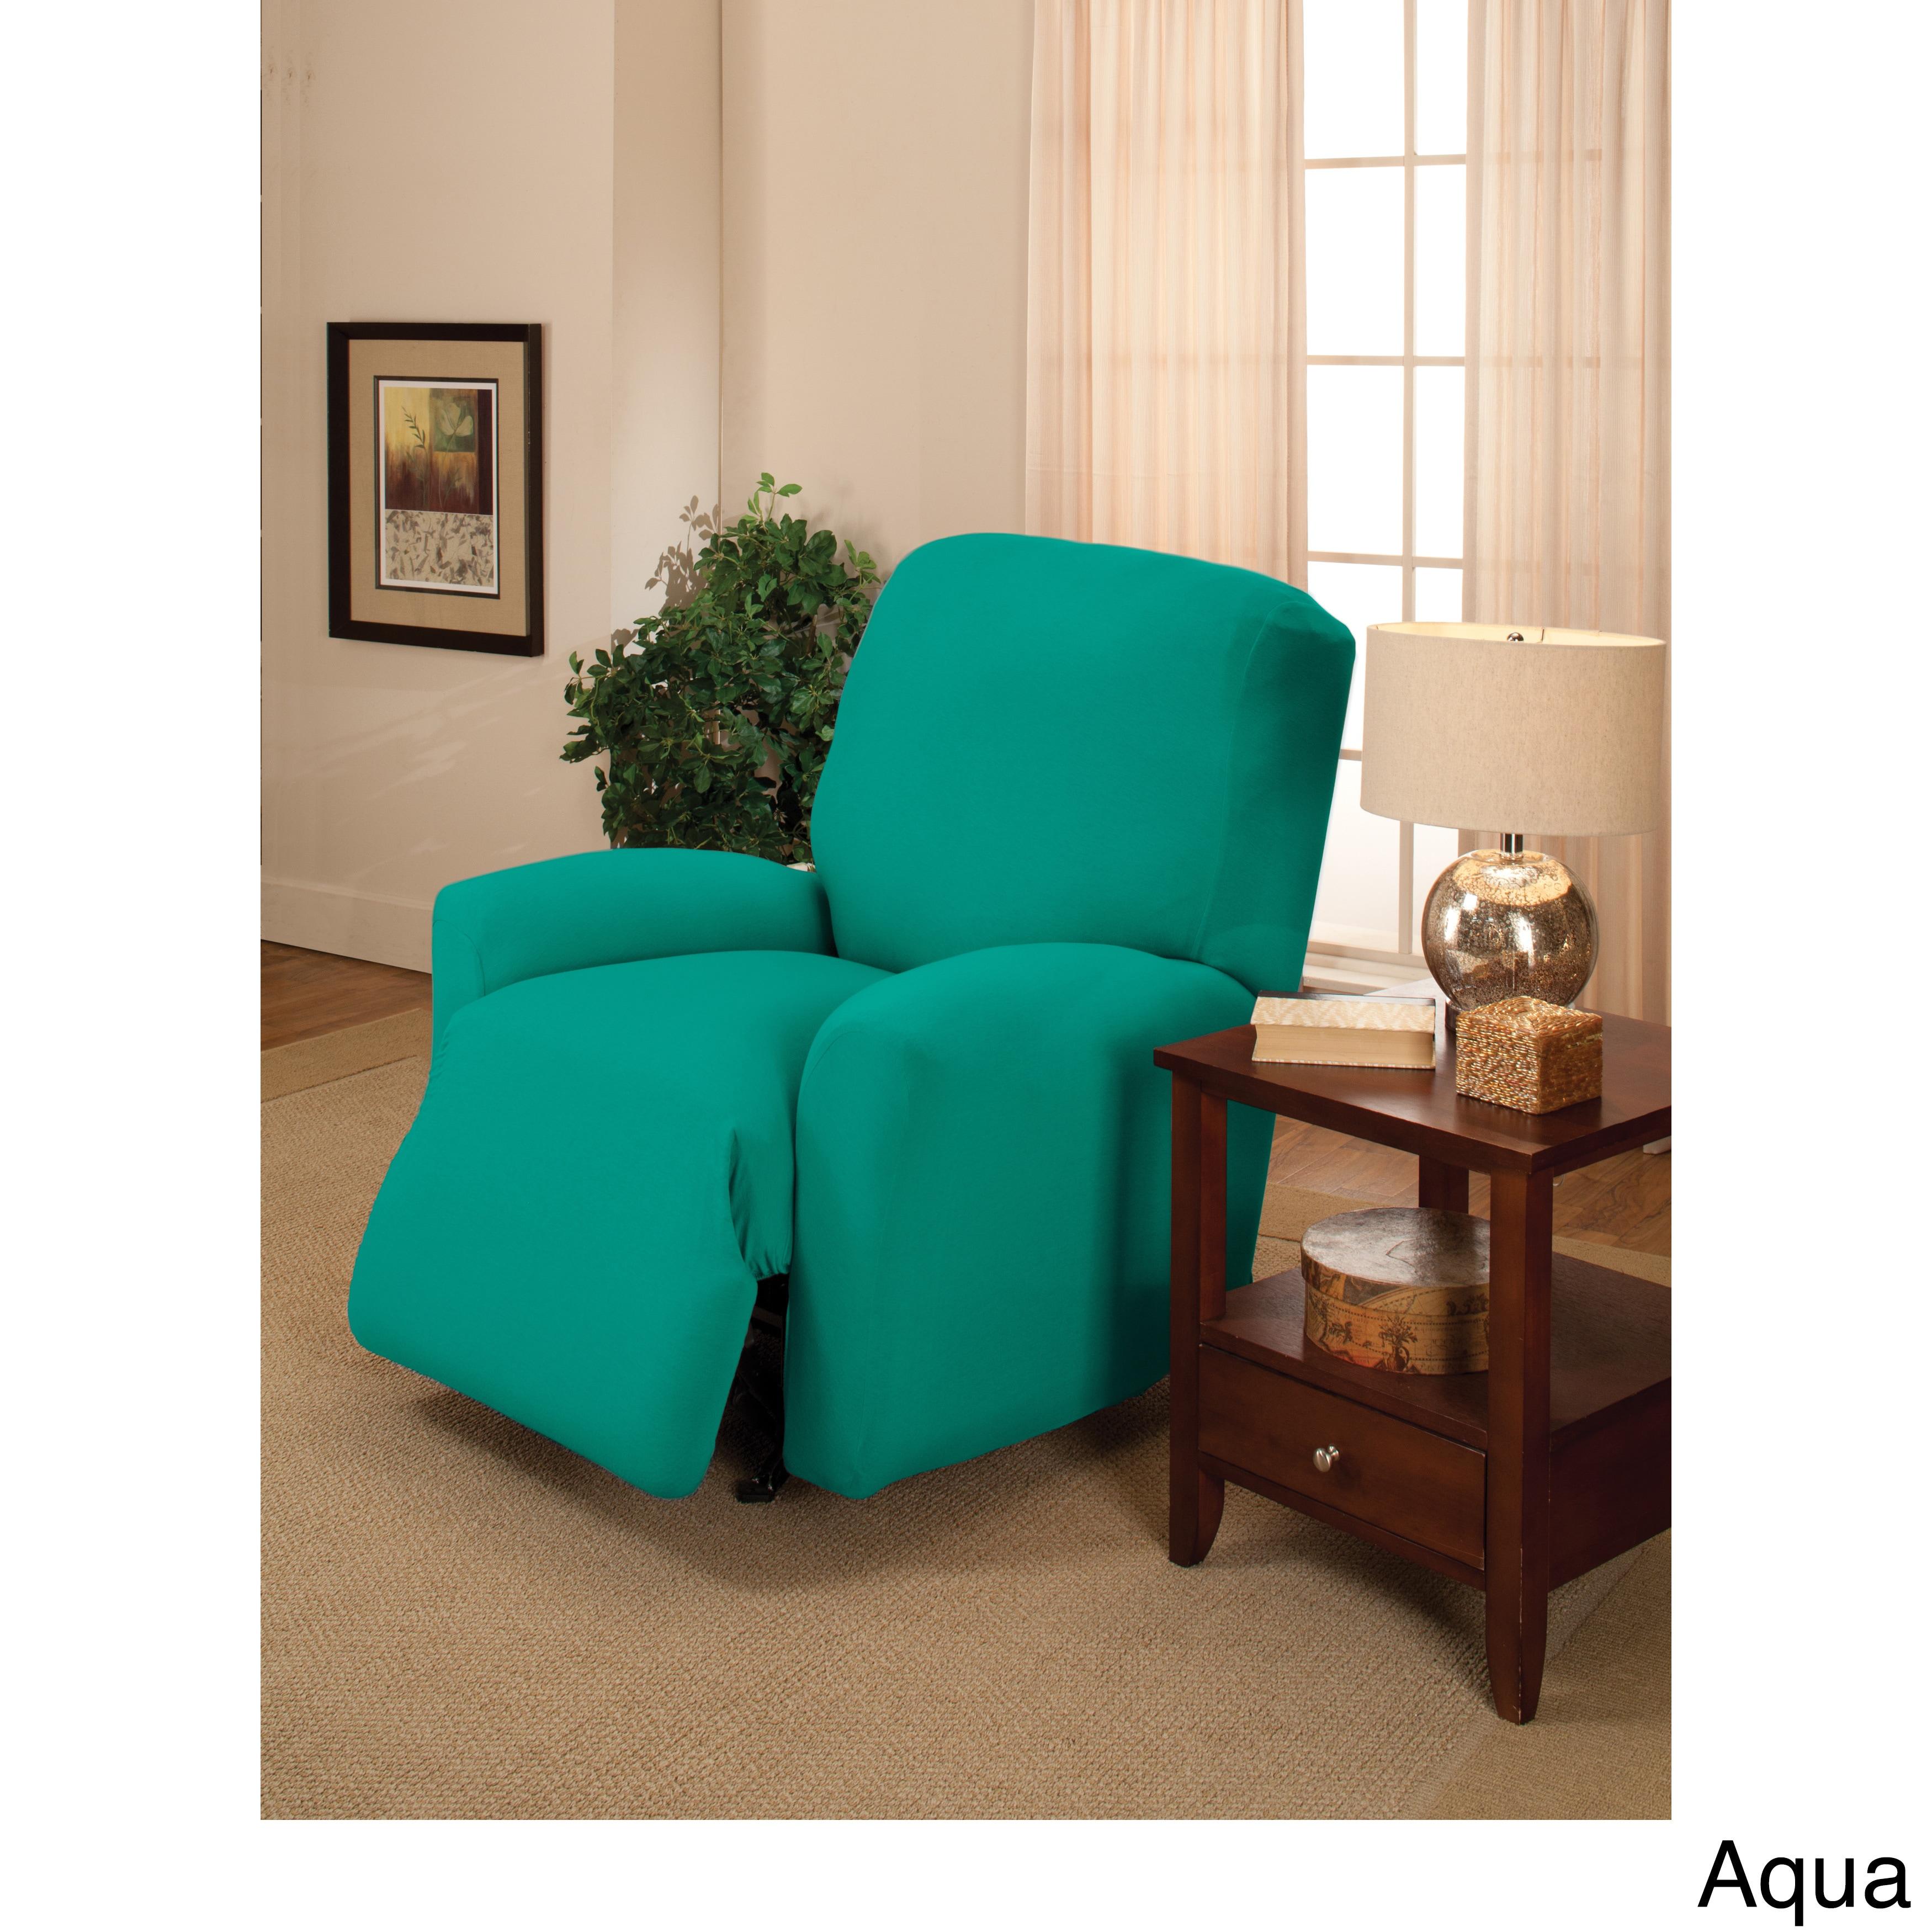 Faux Suede Recliner Chair Furniture Cover 3 Colors READ DESCRIPTION Max Wide 30